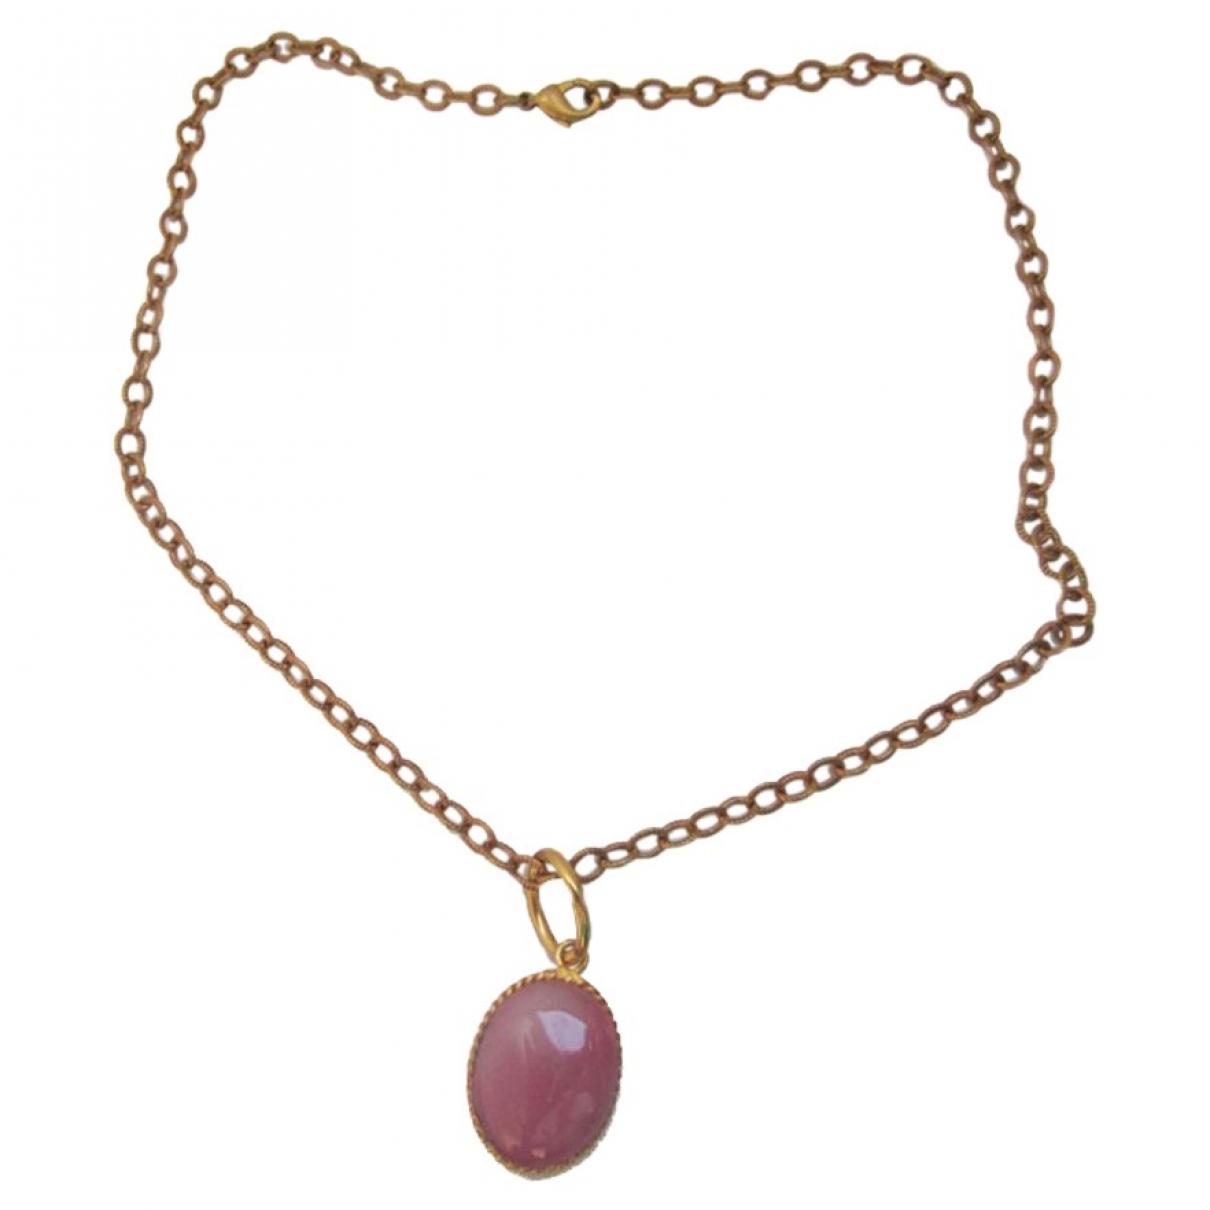 Marguerite De Valois \N Pink Glass necklace for Women \N